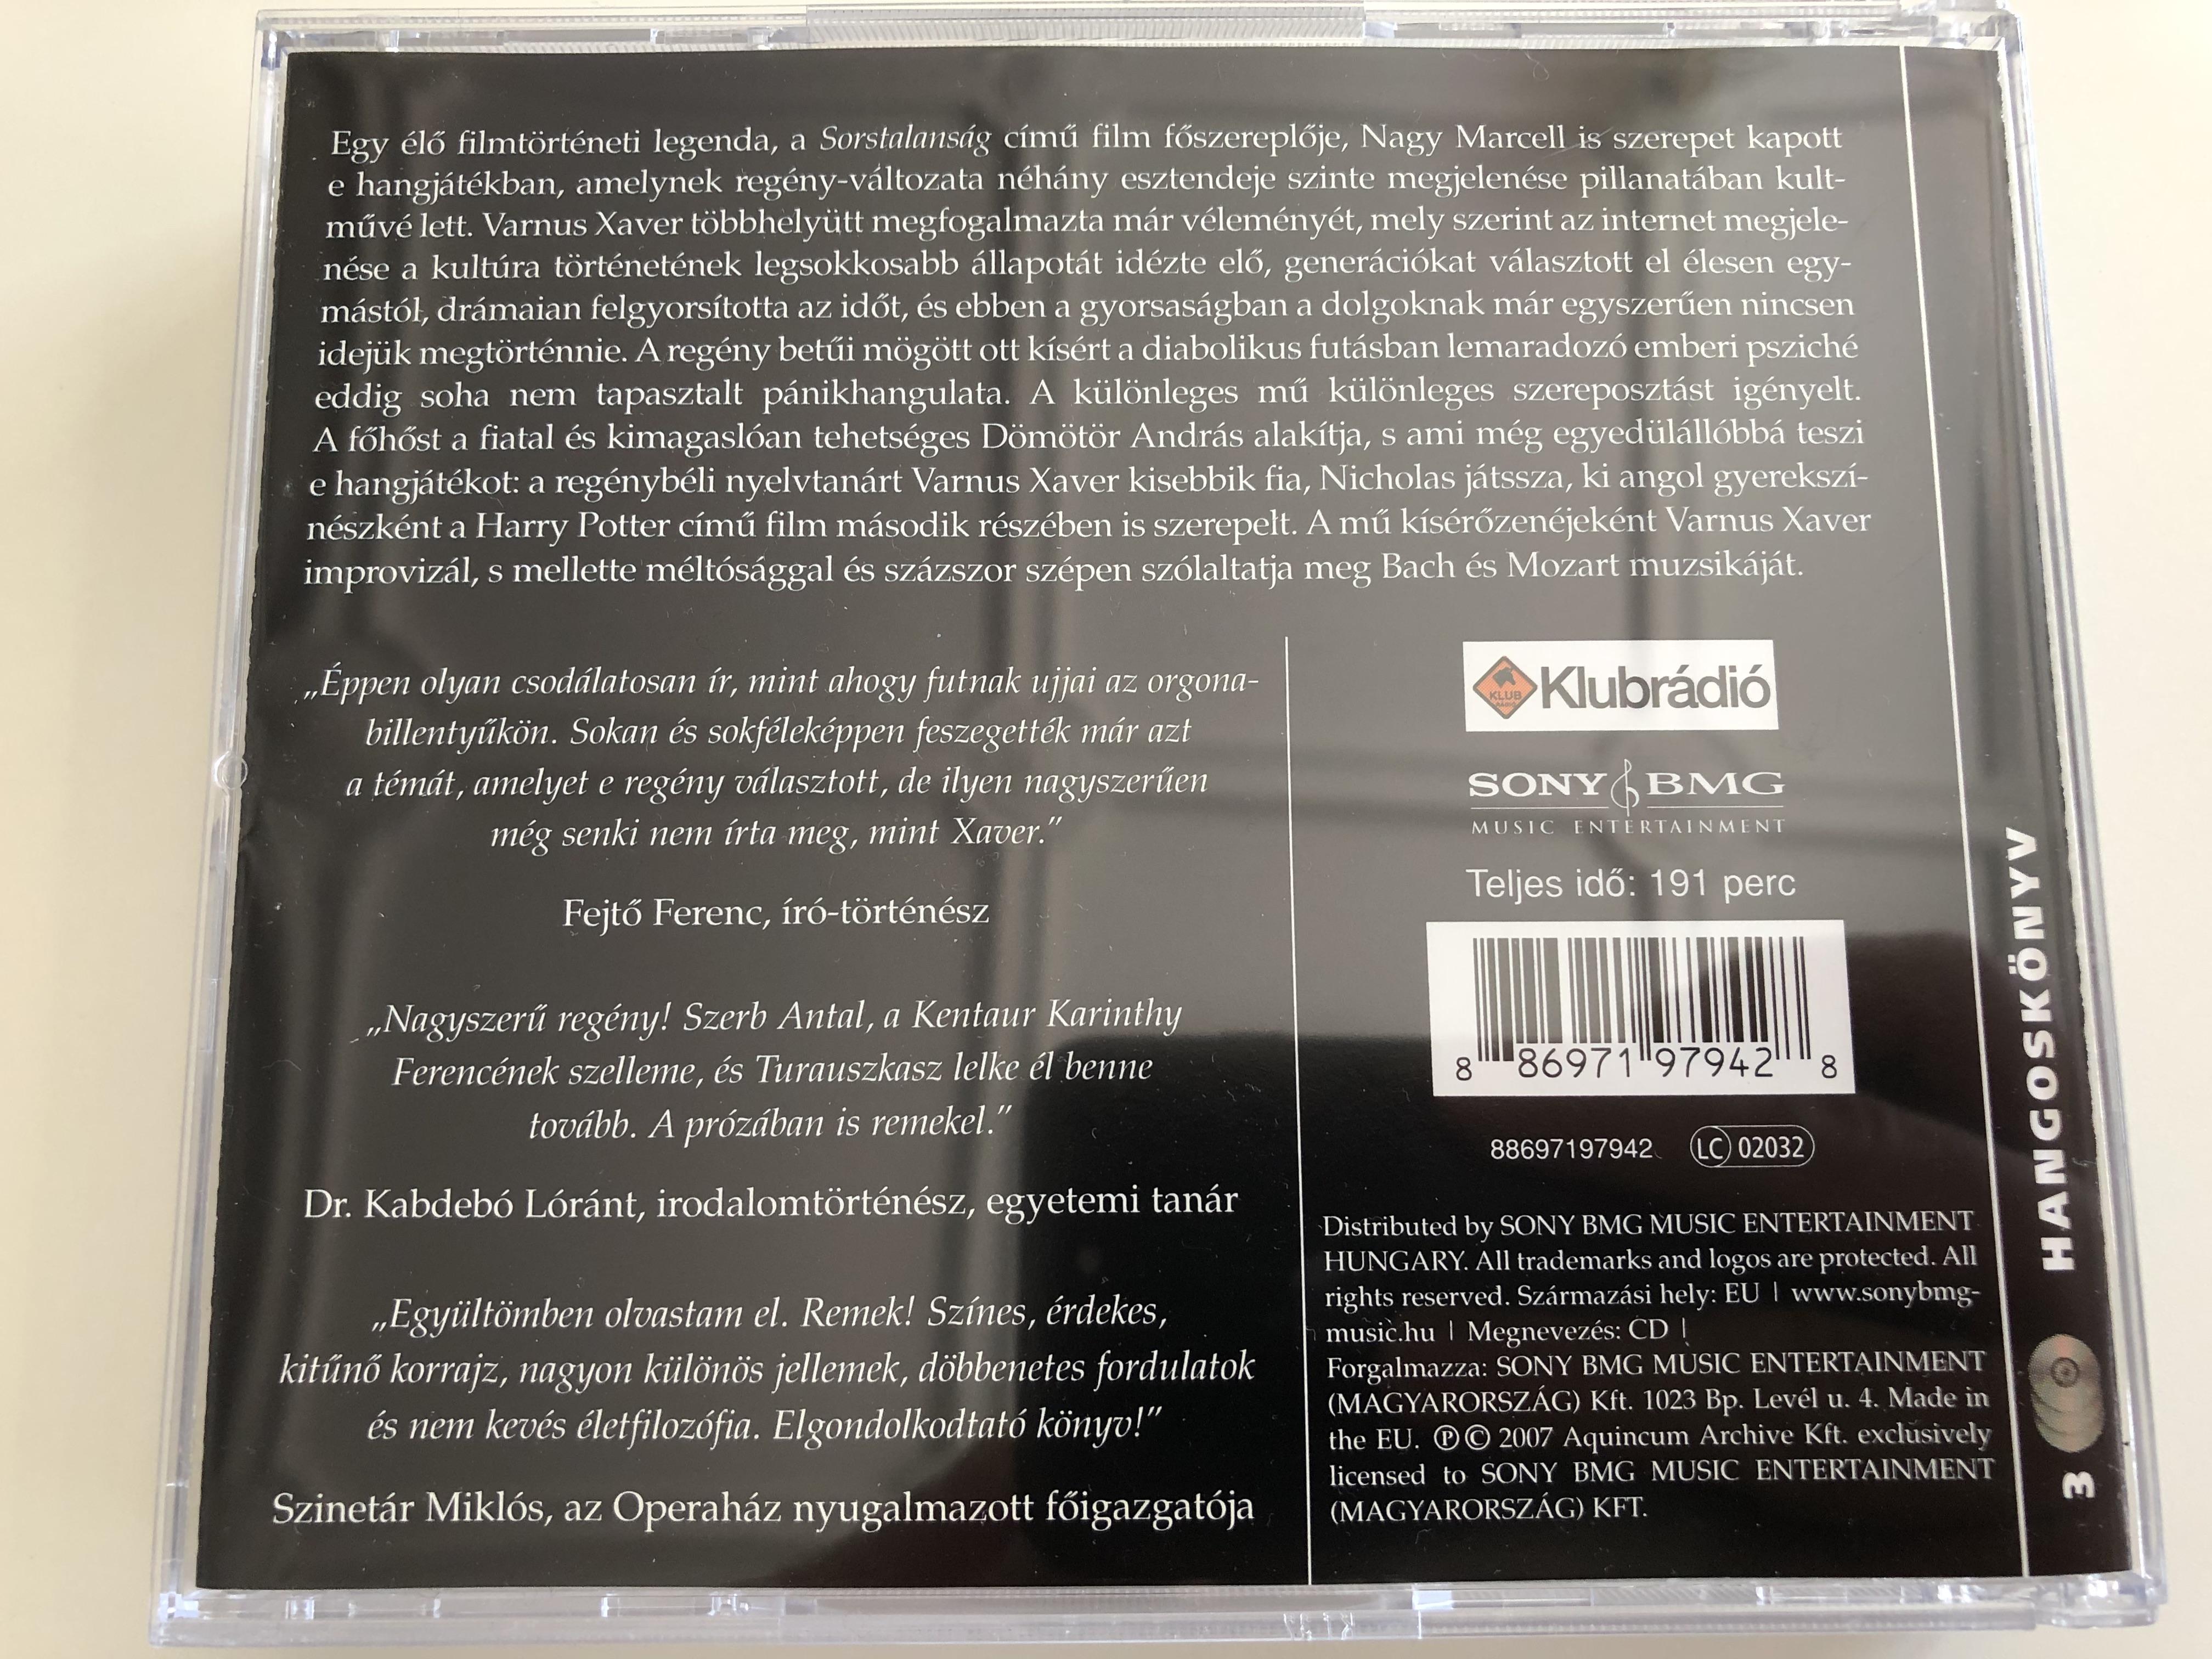 -tv-ltoz-sok-by-varnus-xaver-3-cd-audio-book-the-audio-version-of-the-novel-music-by-varnus-xaver-sony-music-entertainment-2003-3-.jpg